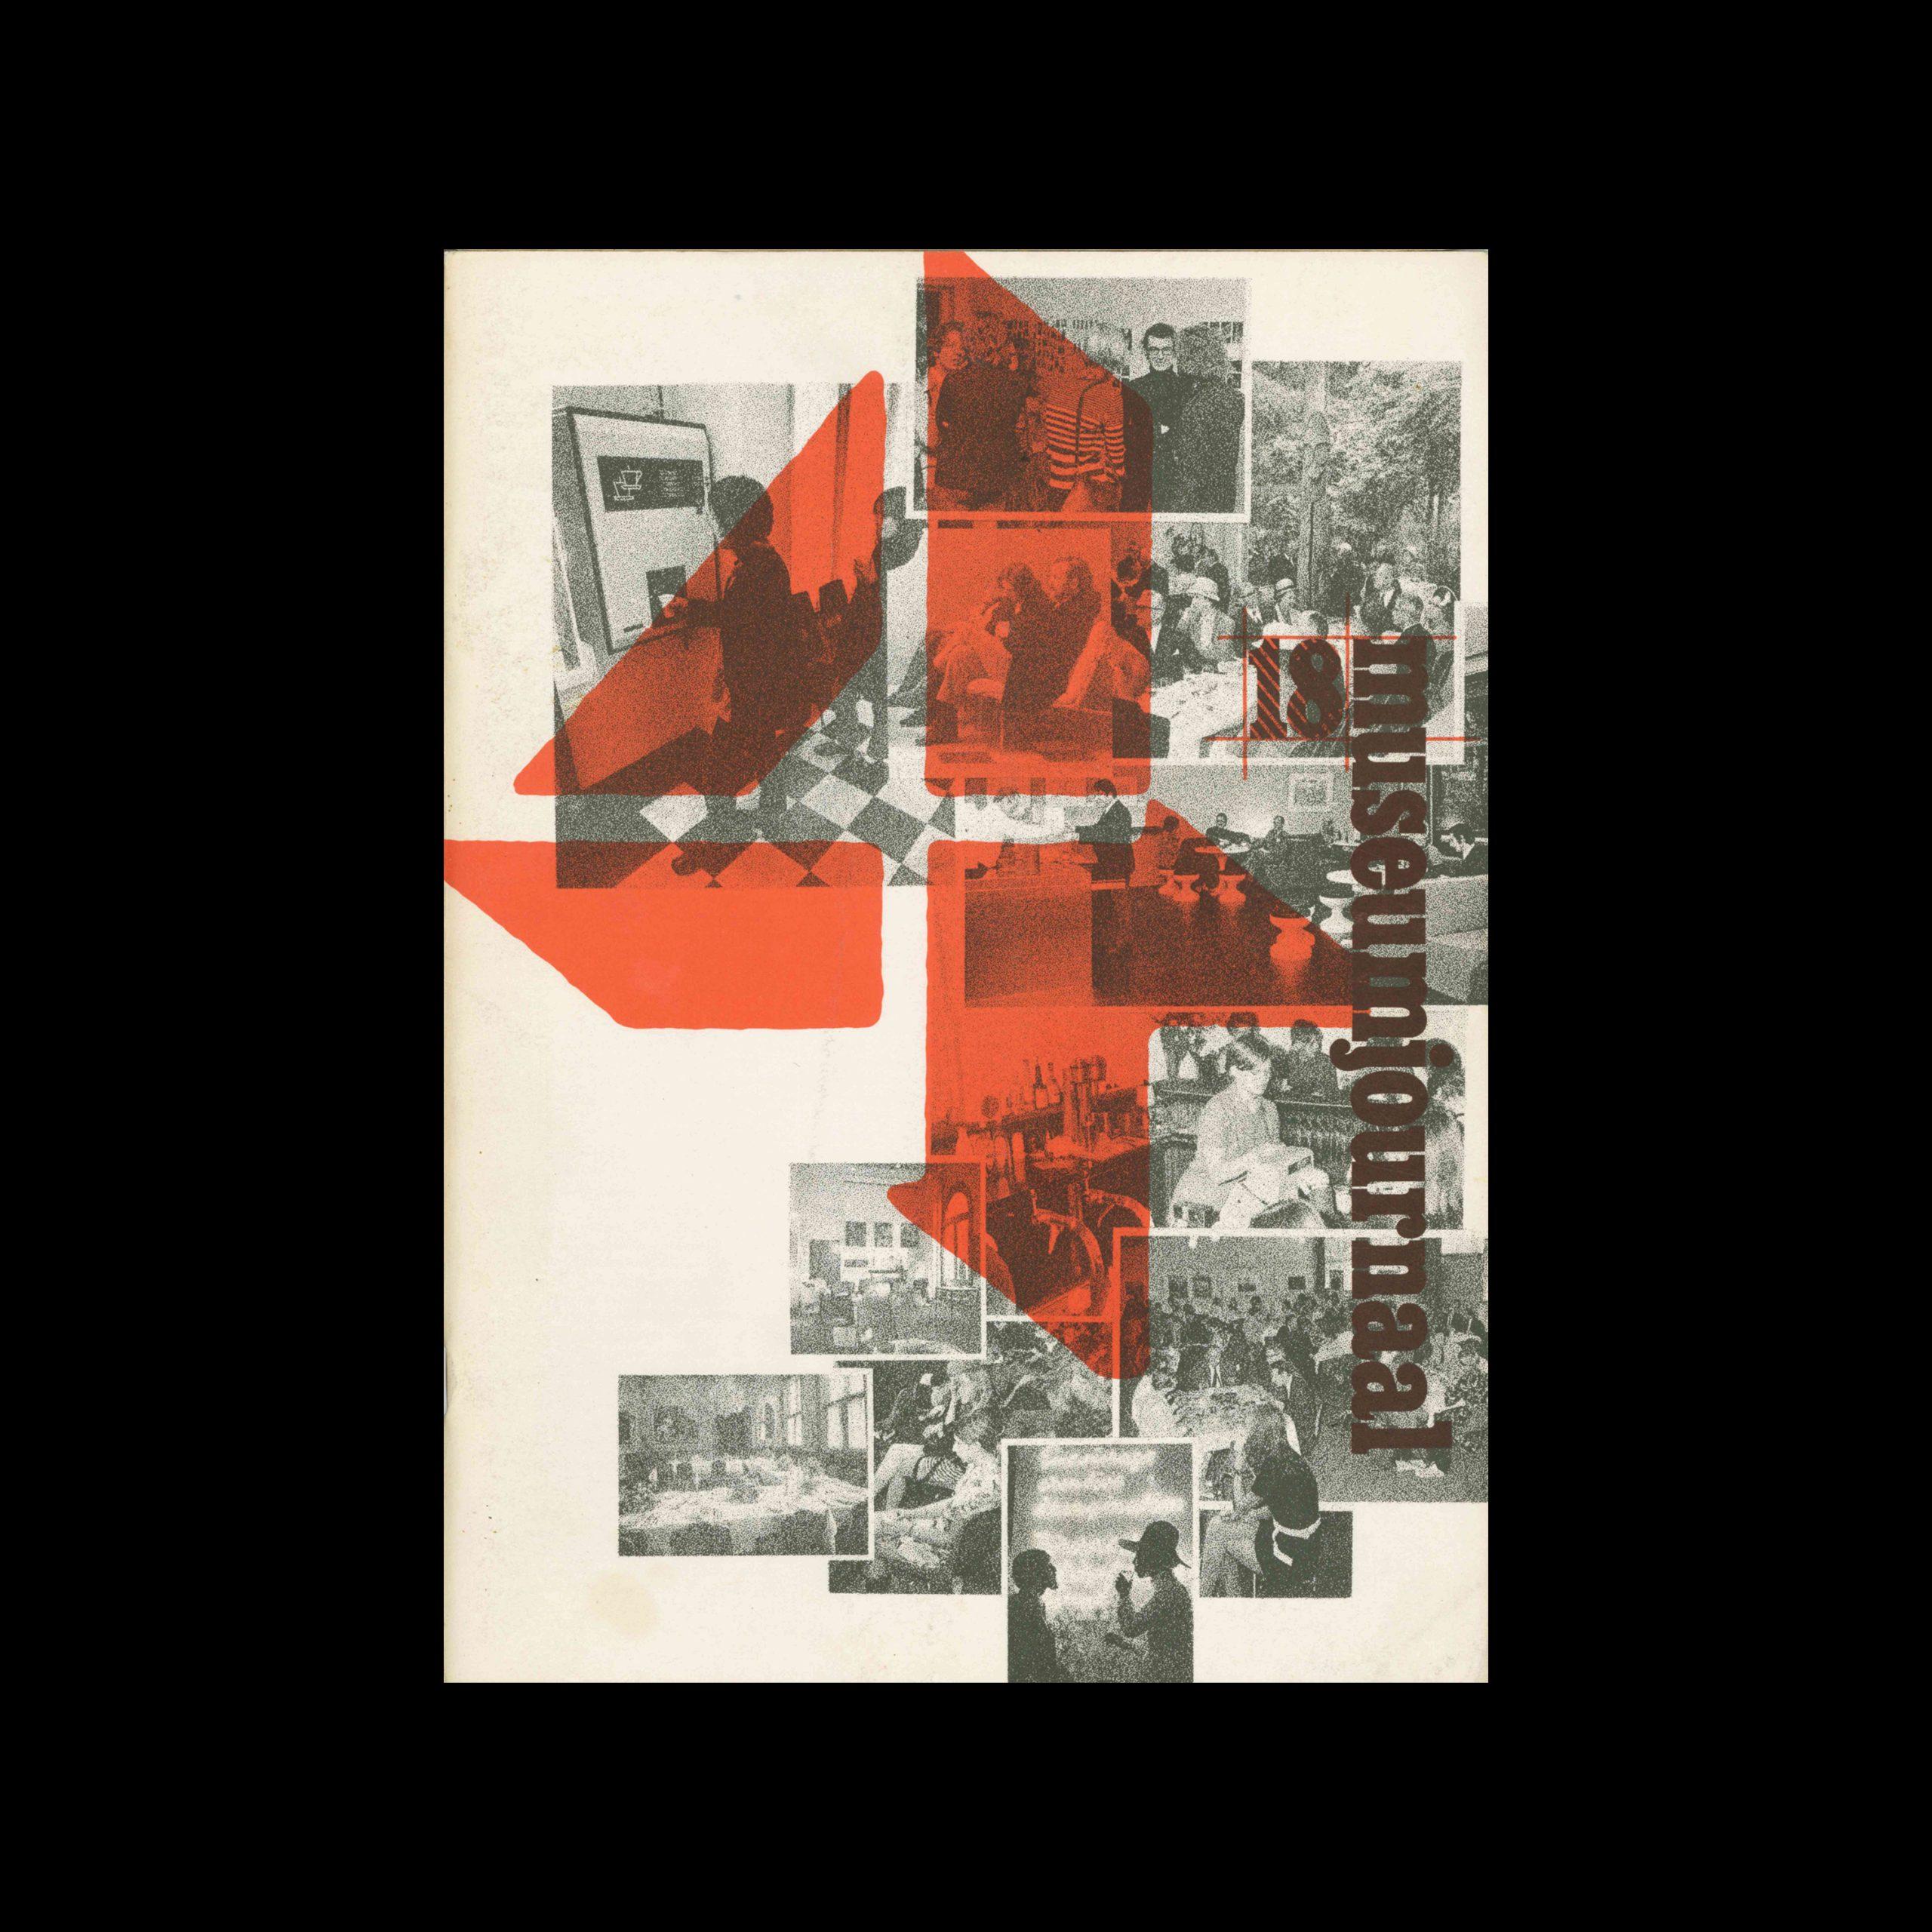 Museumjournaal, Serie 18 no4, 1973. Frank Steenhagen (cover), Jurriaan Schrofer (layout)